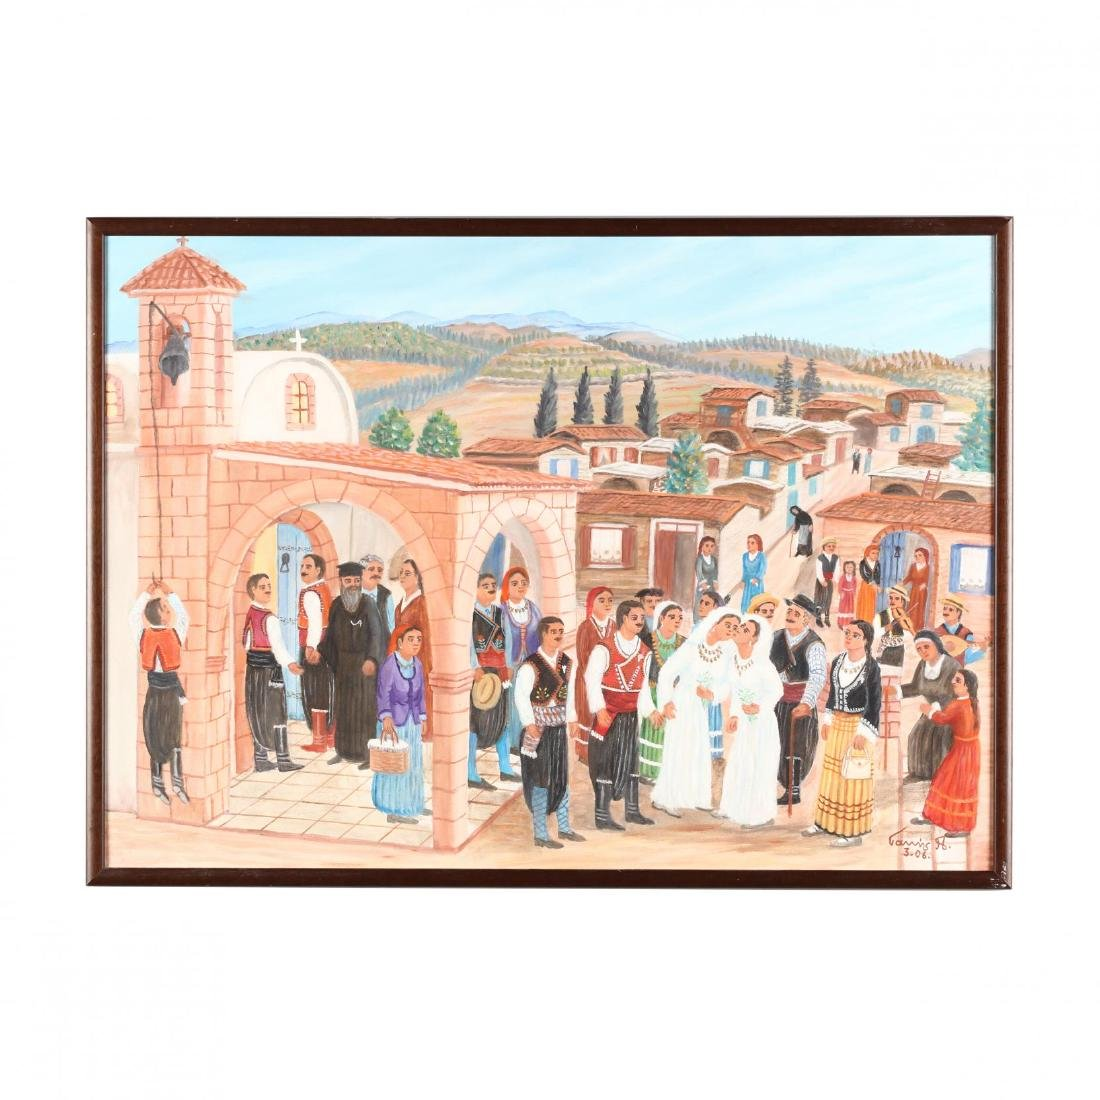 Yiannis Pelekanos (Cypriot, b. 1937), A Village Wedding